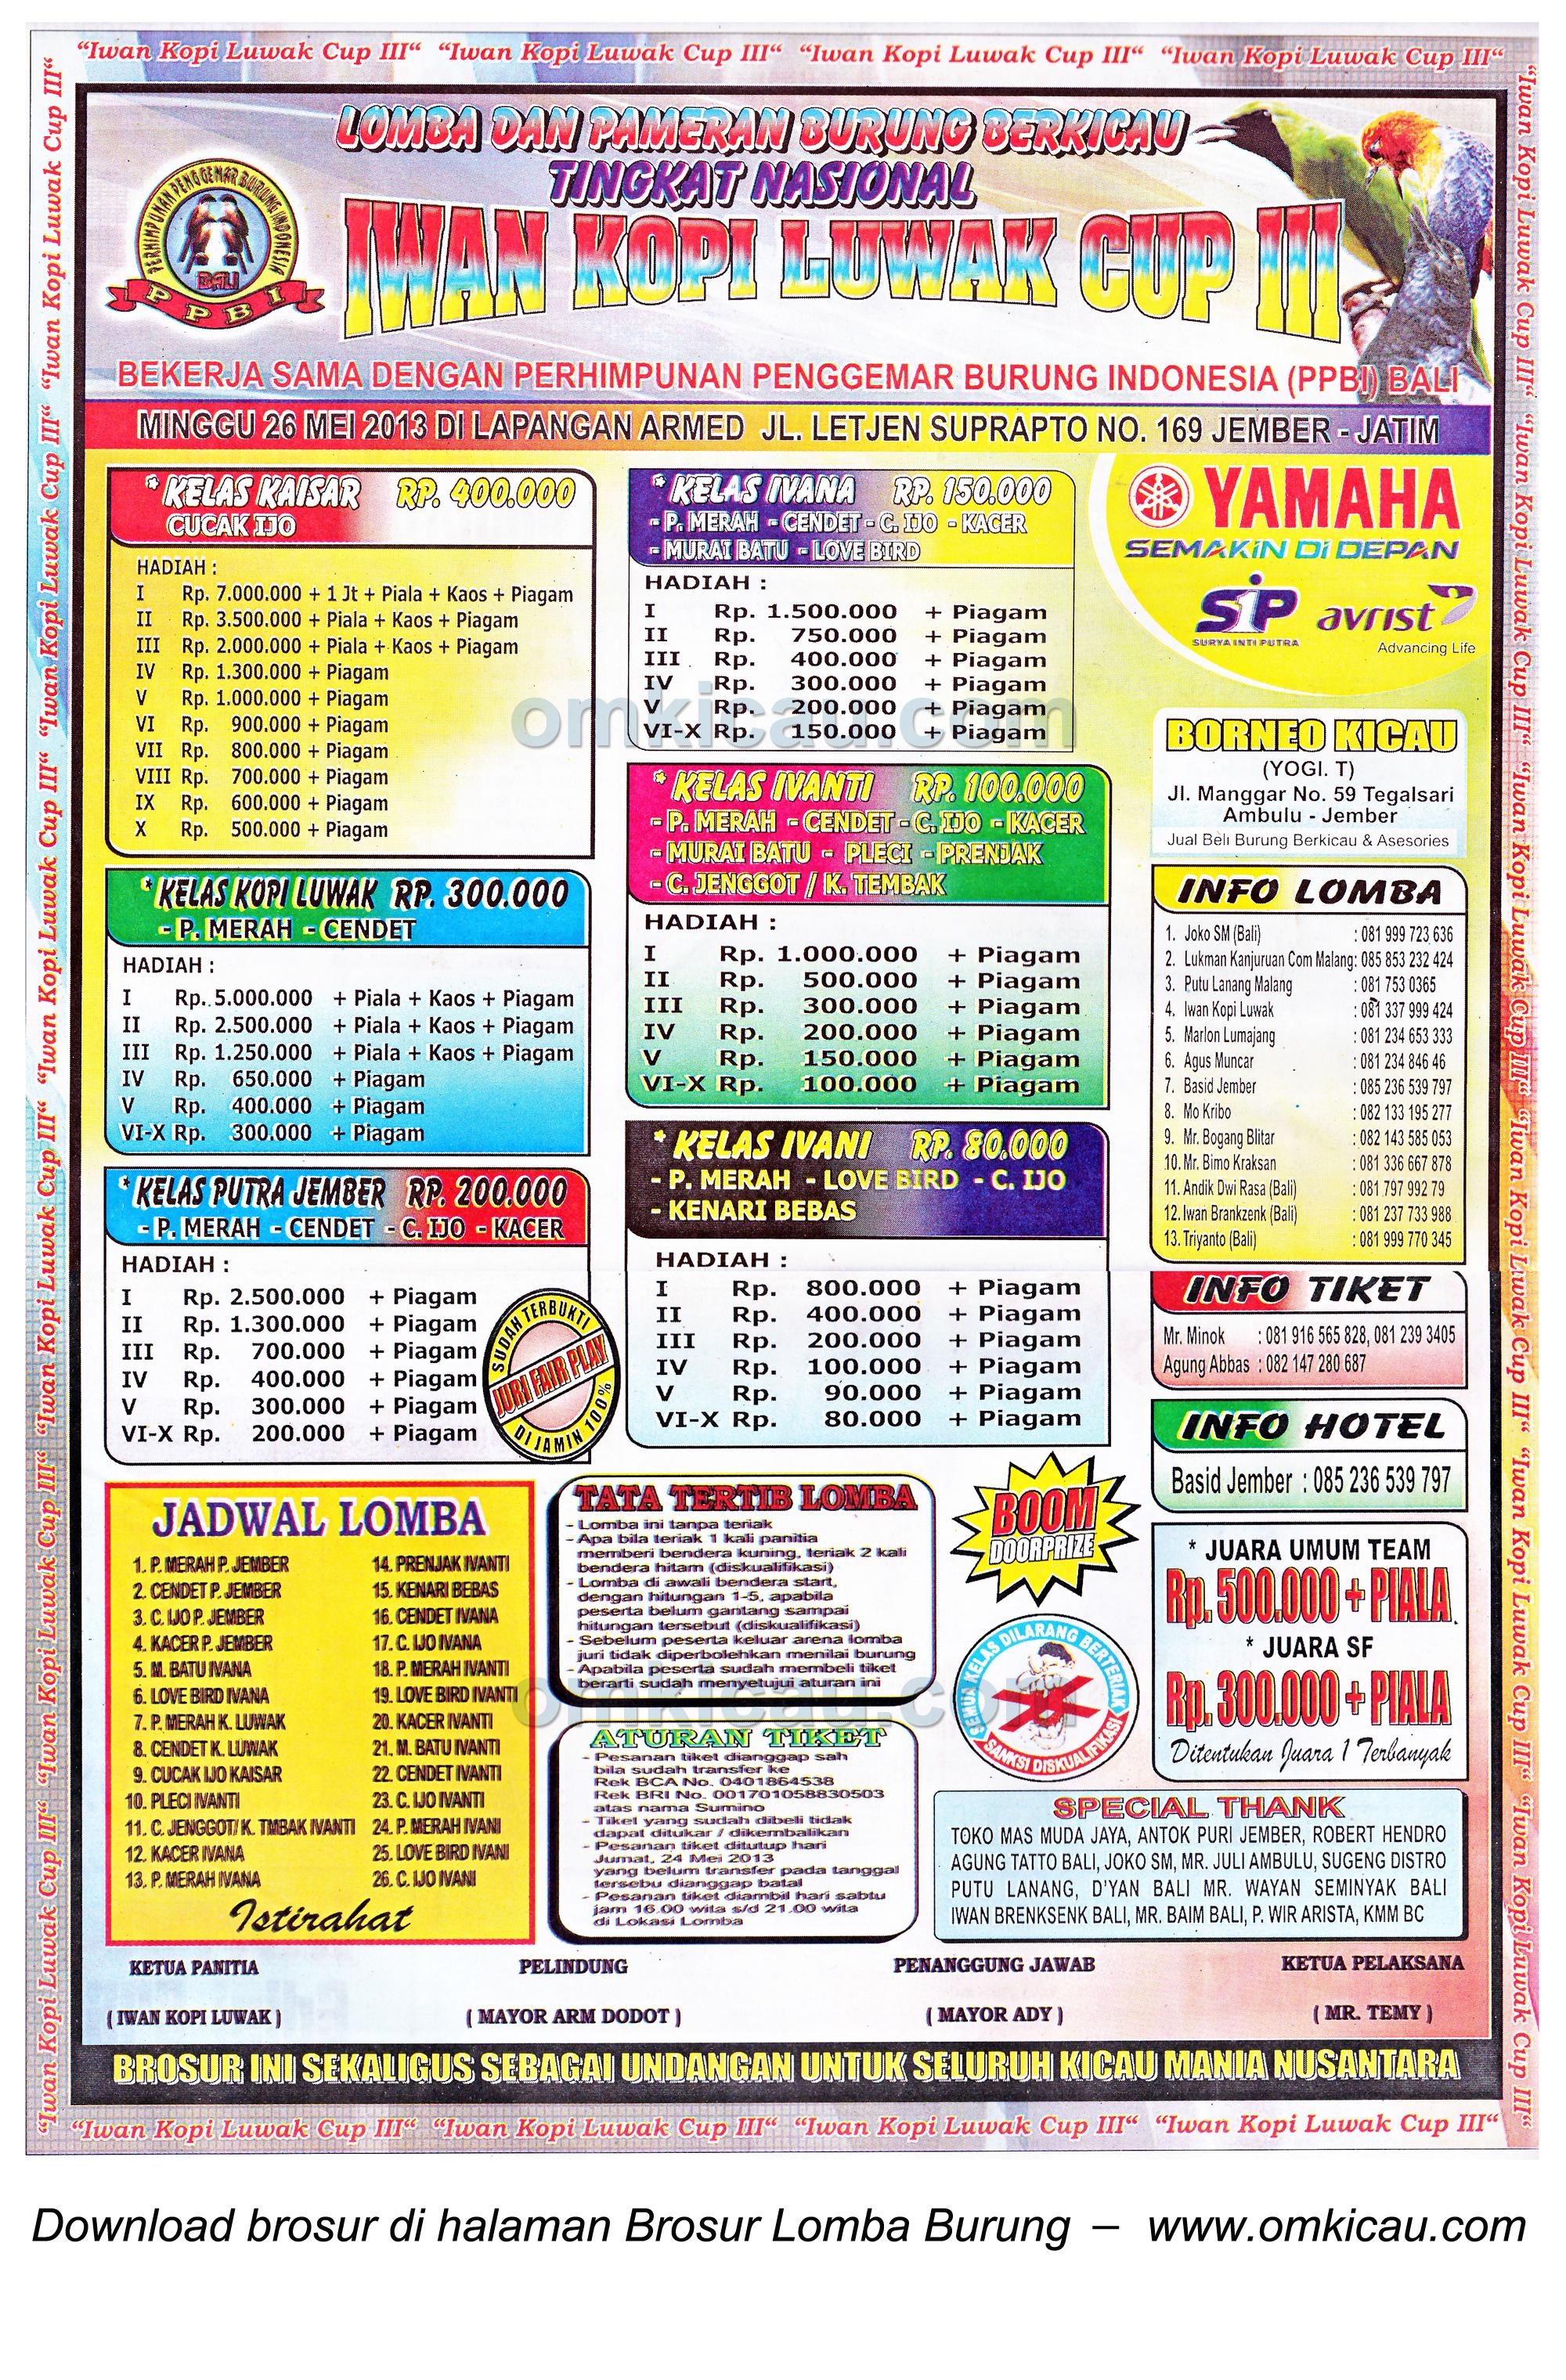 Brosur Lomba Burung Iwan Kopi Luwak Cup III, Jember, 26 Mei 2013